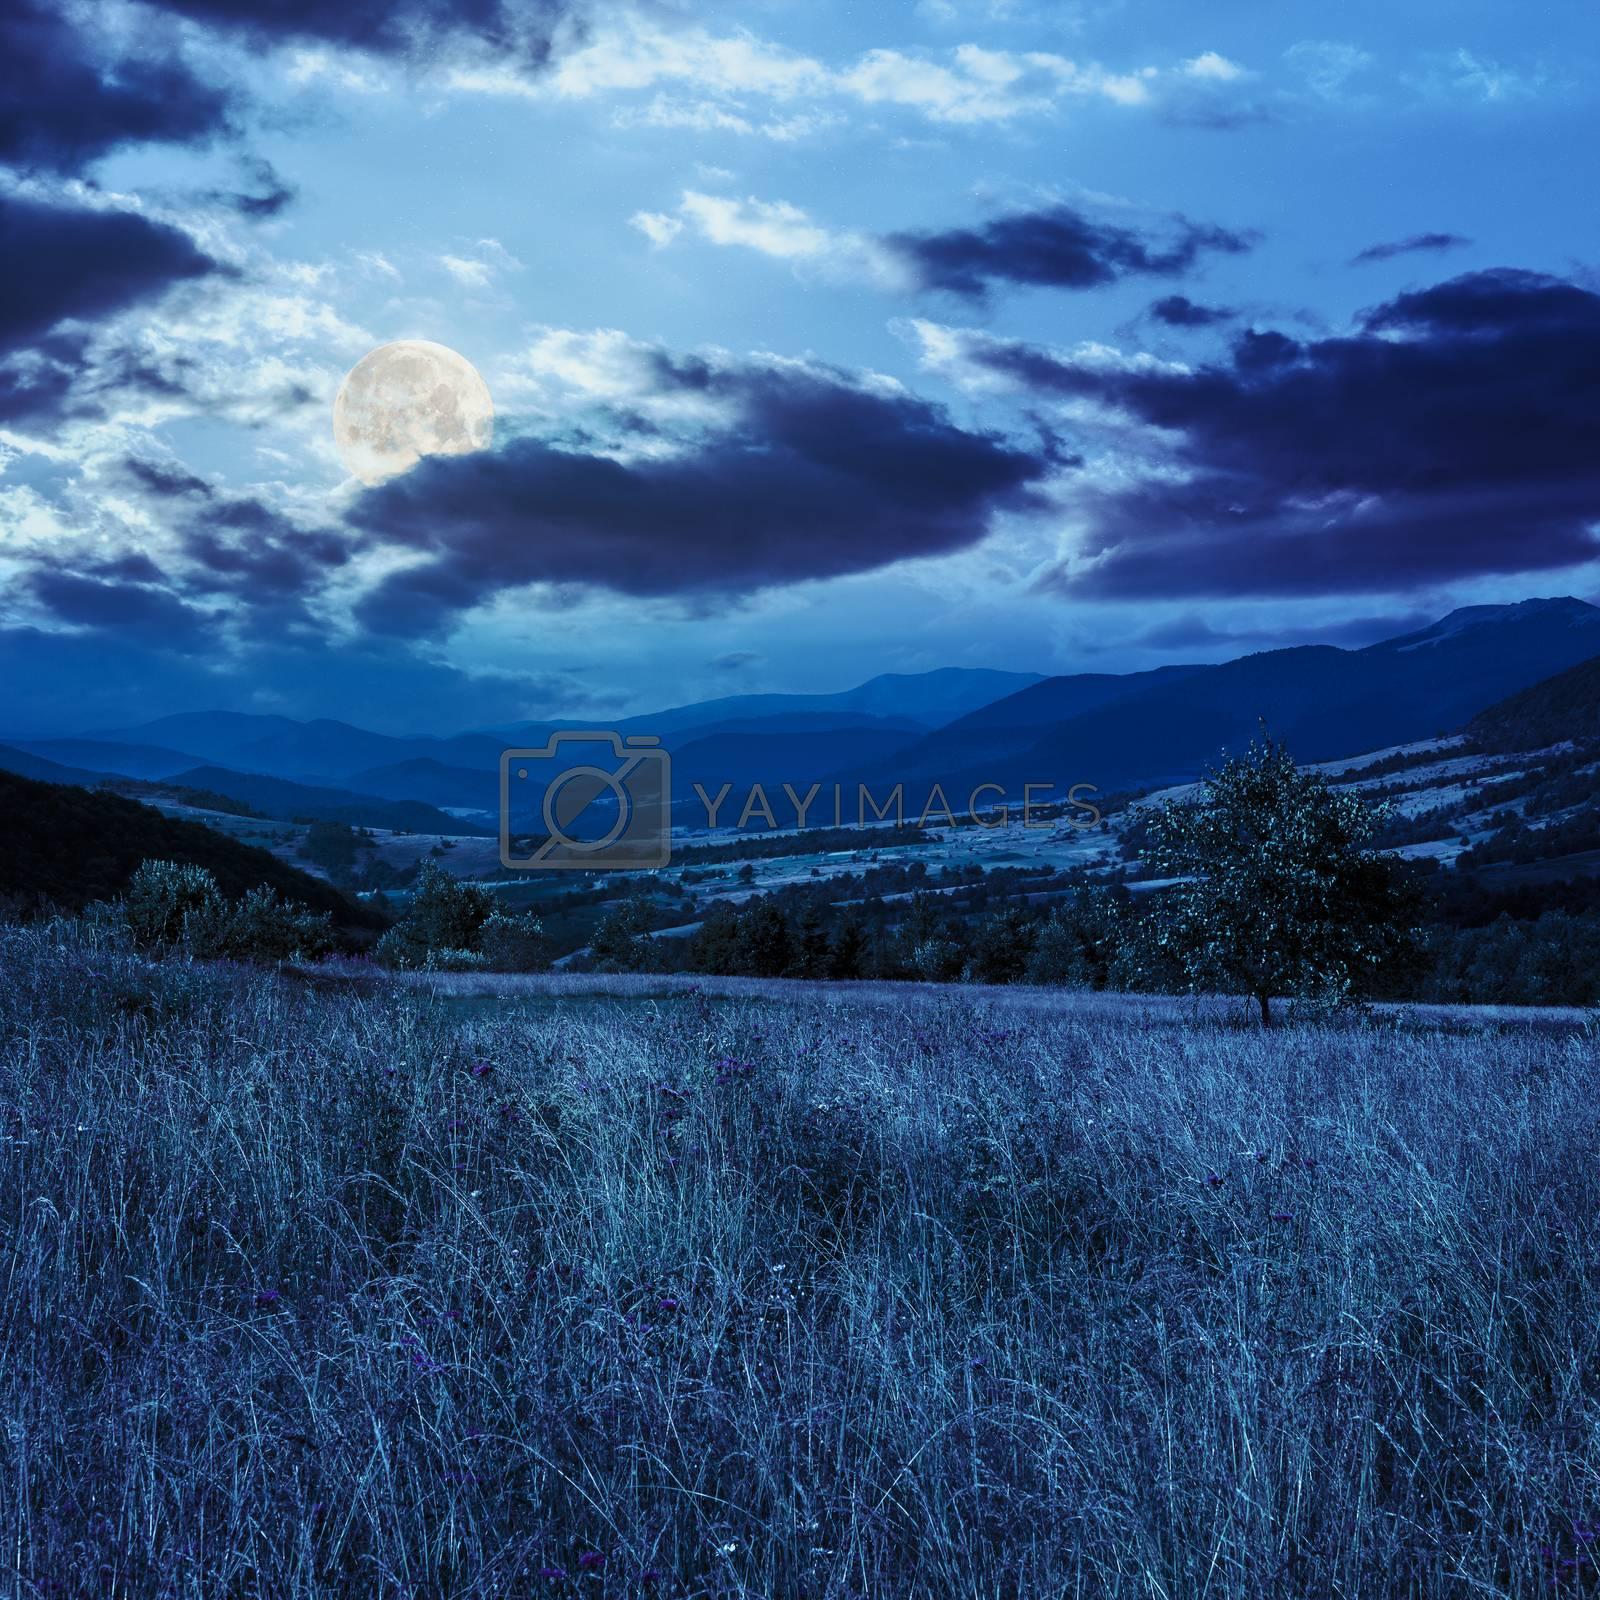 field near home at night by Pellinni